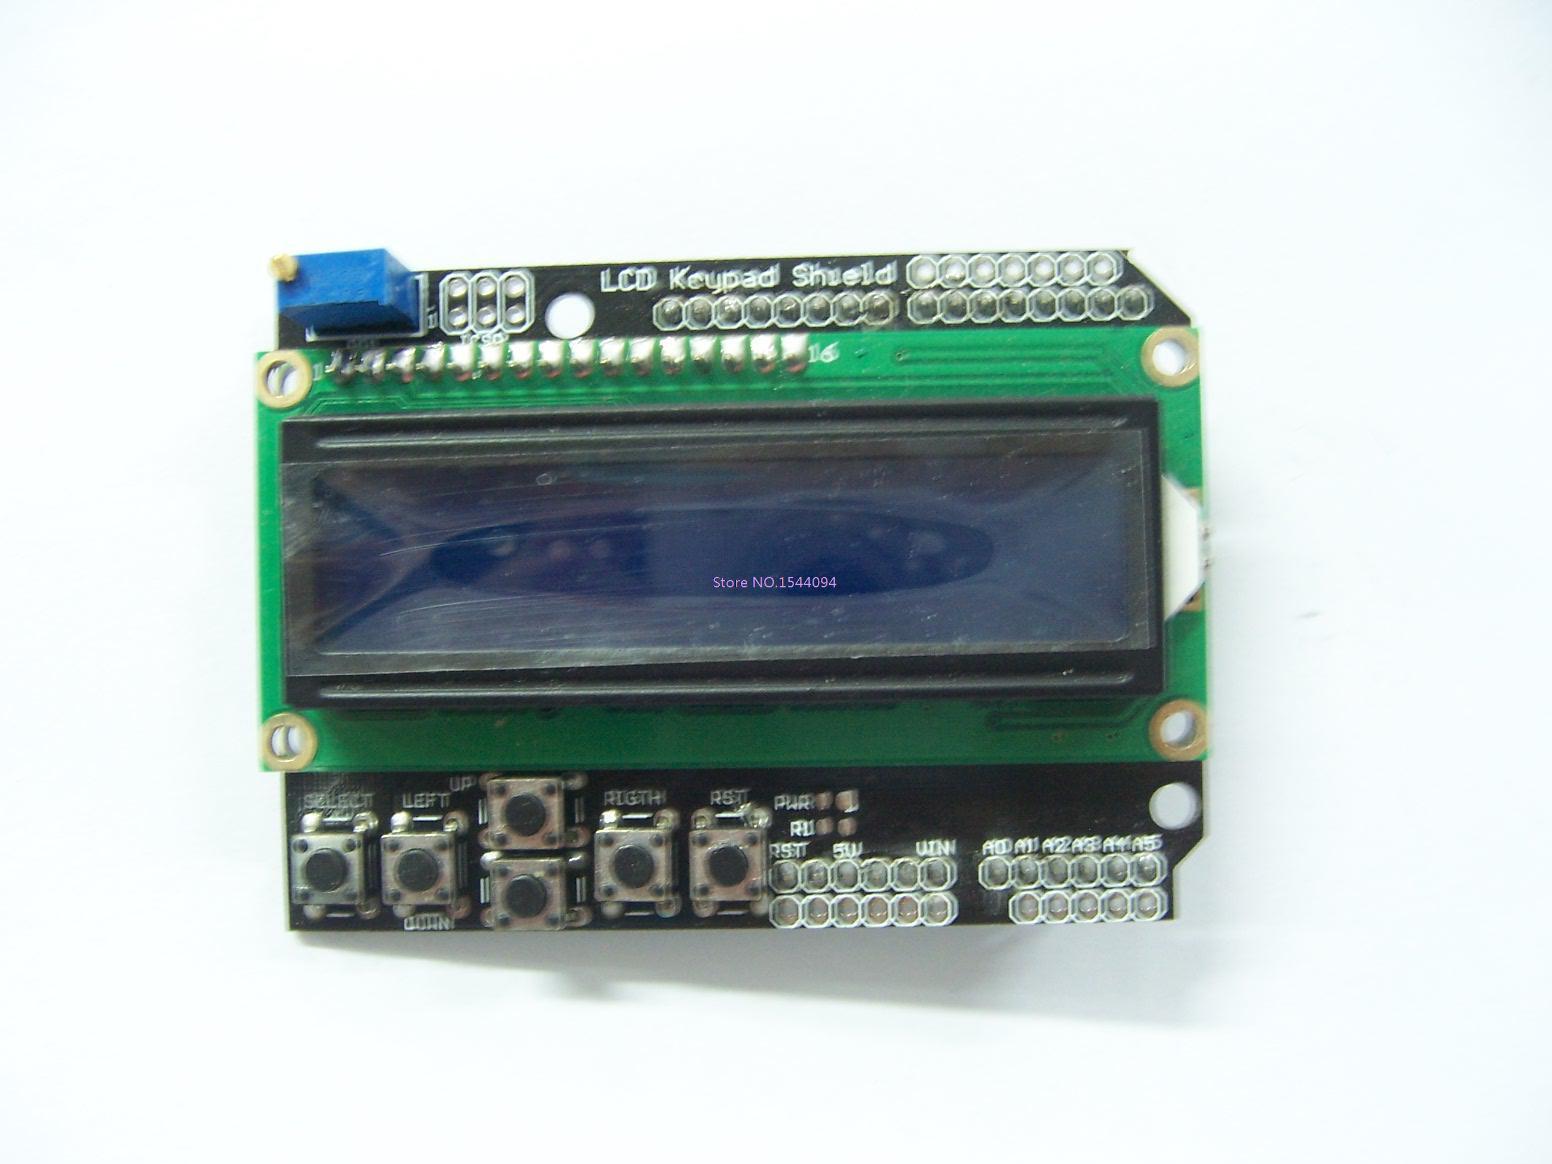 Lcd keypad shield module display for